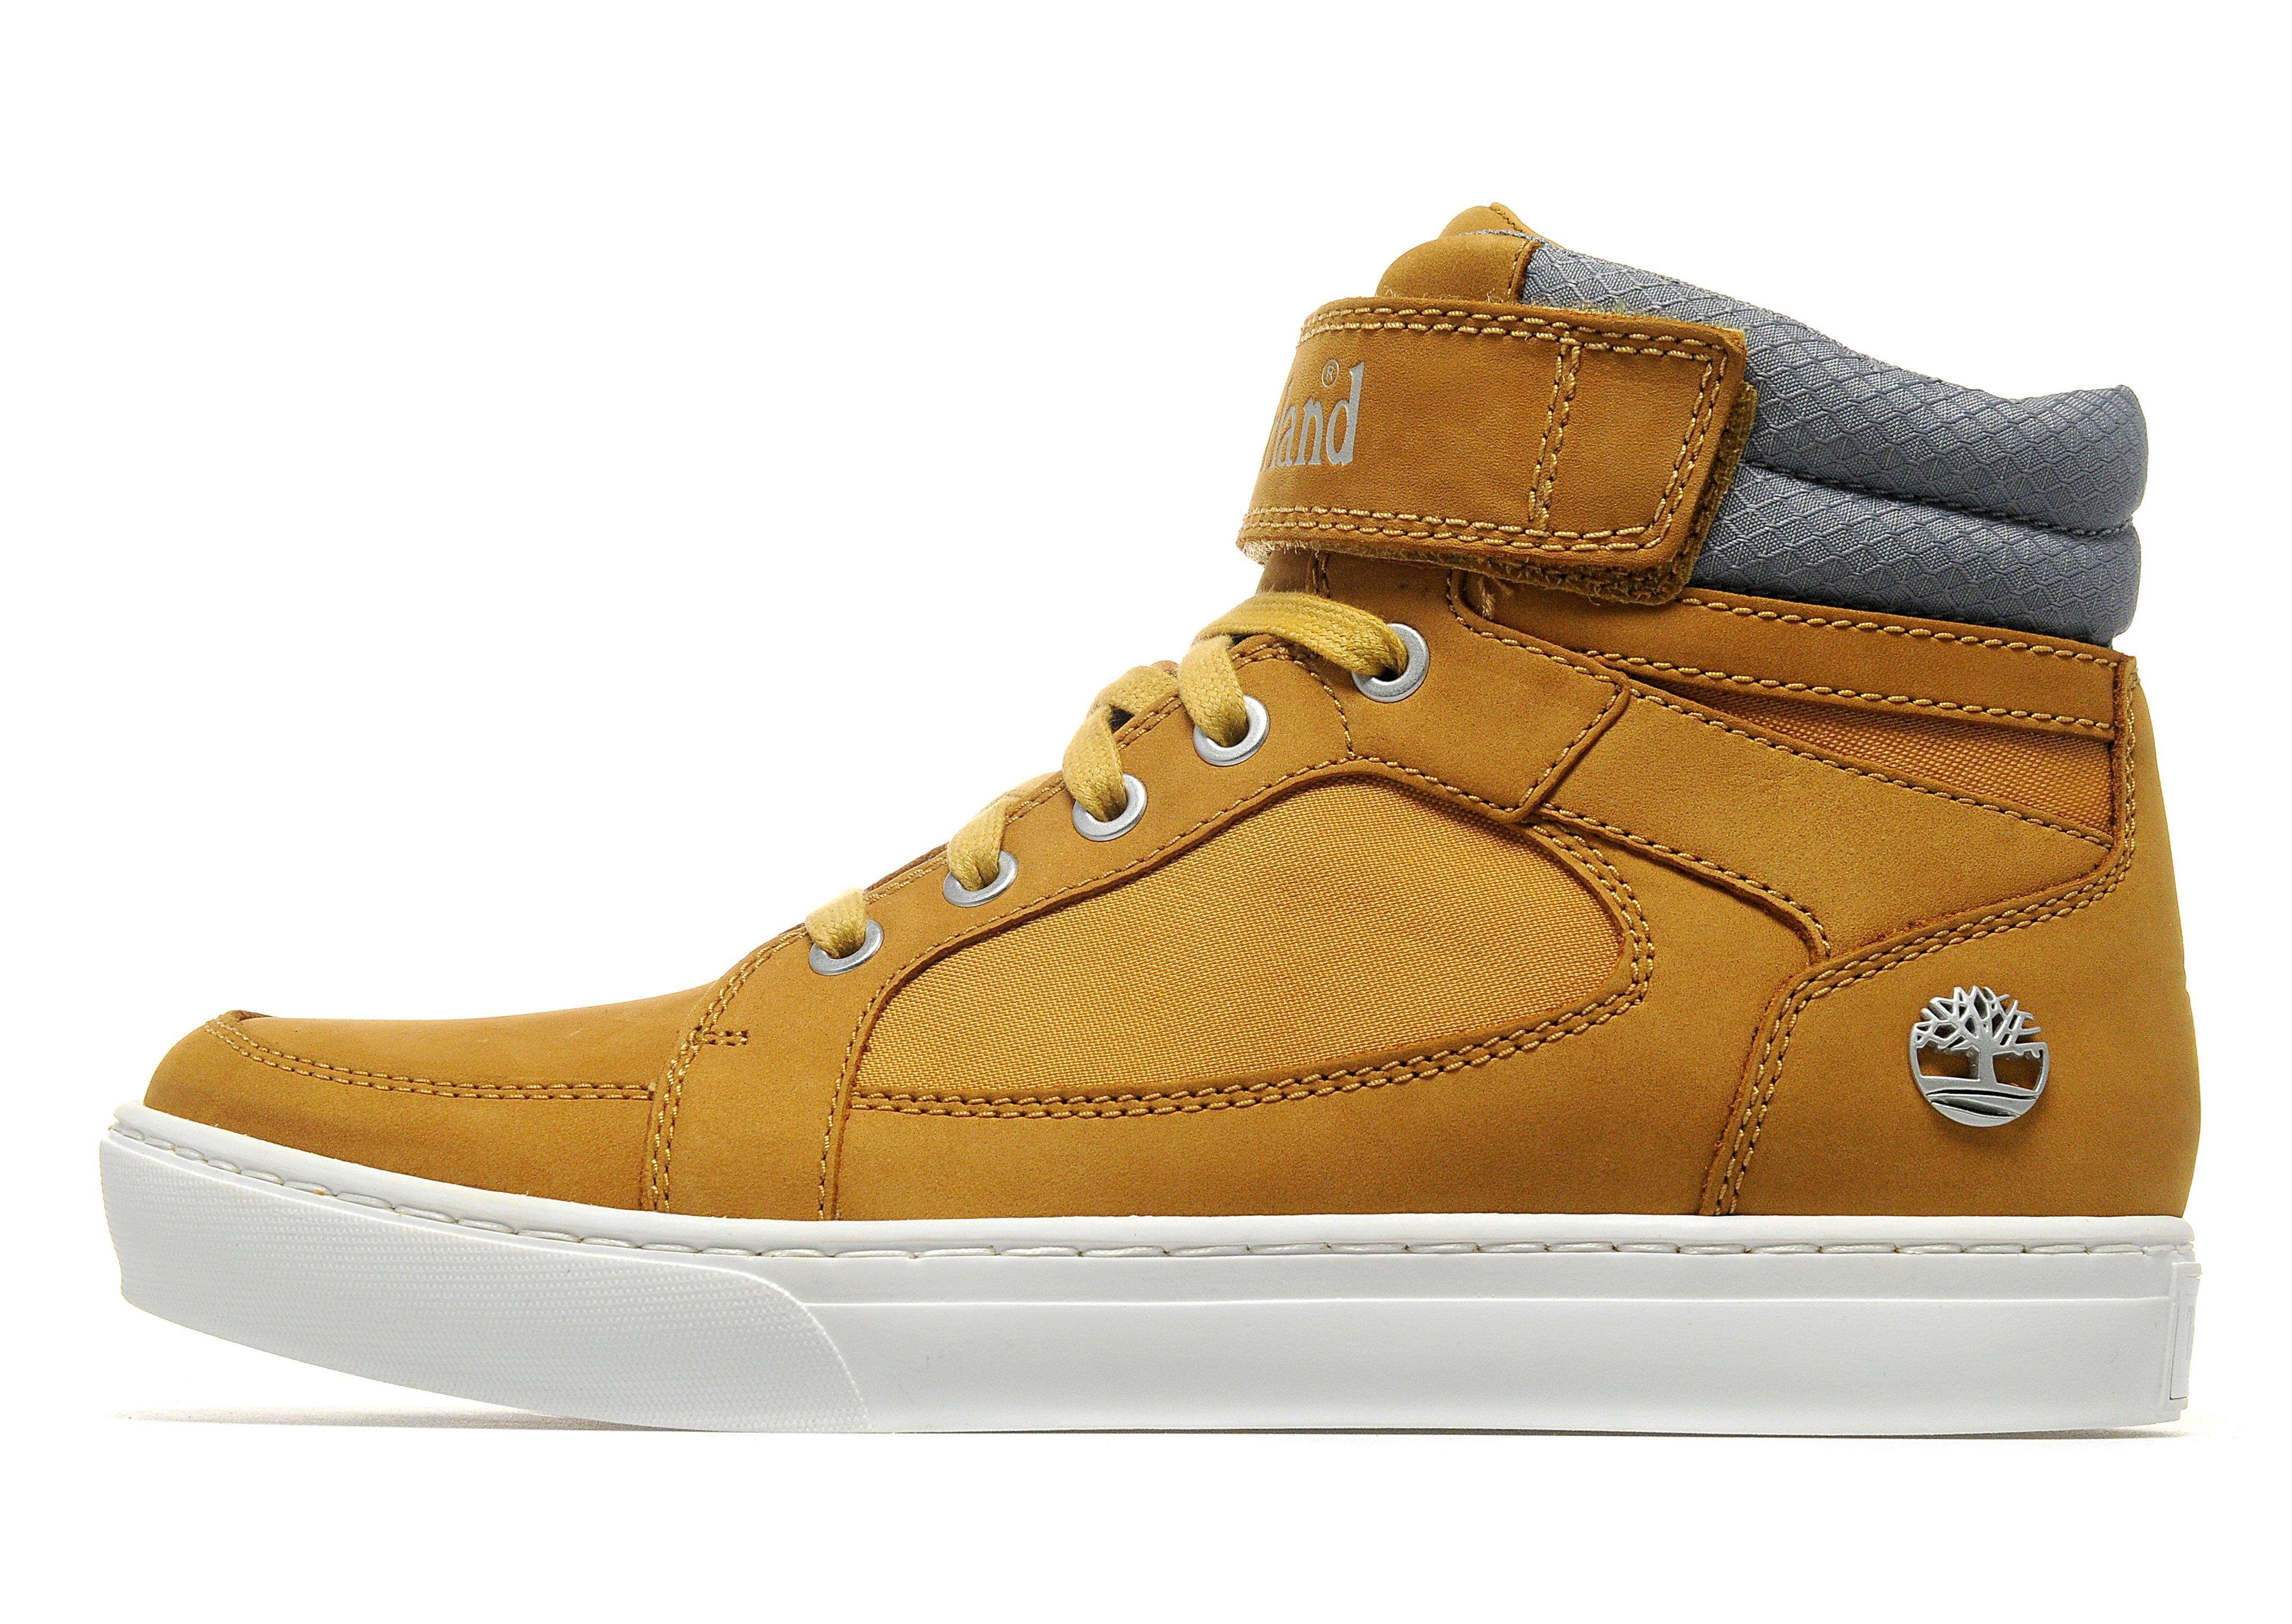 Timberland Ortholite Mens Shoes